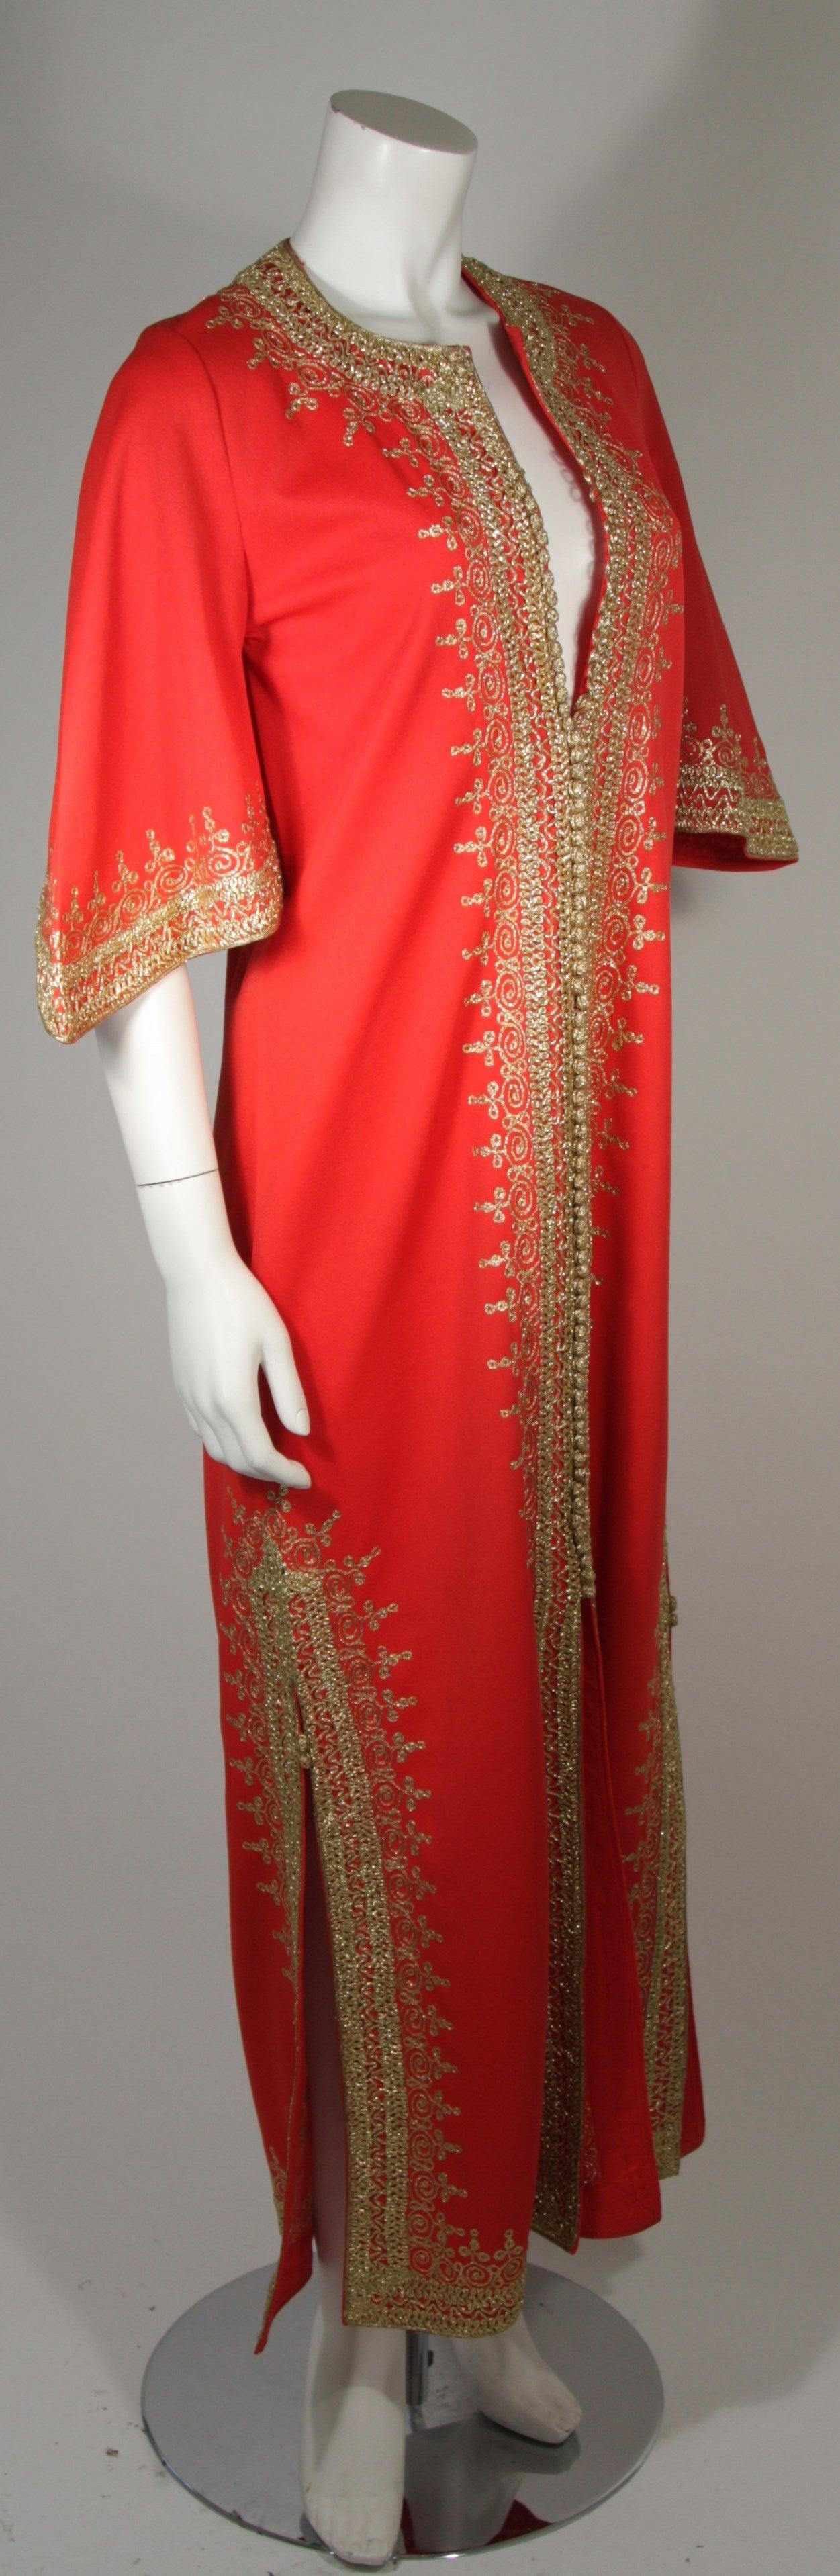 Custom Orange and Gold Indian Kaftan Size Small 4